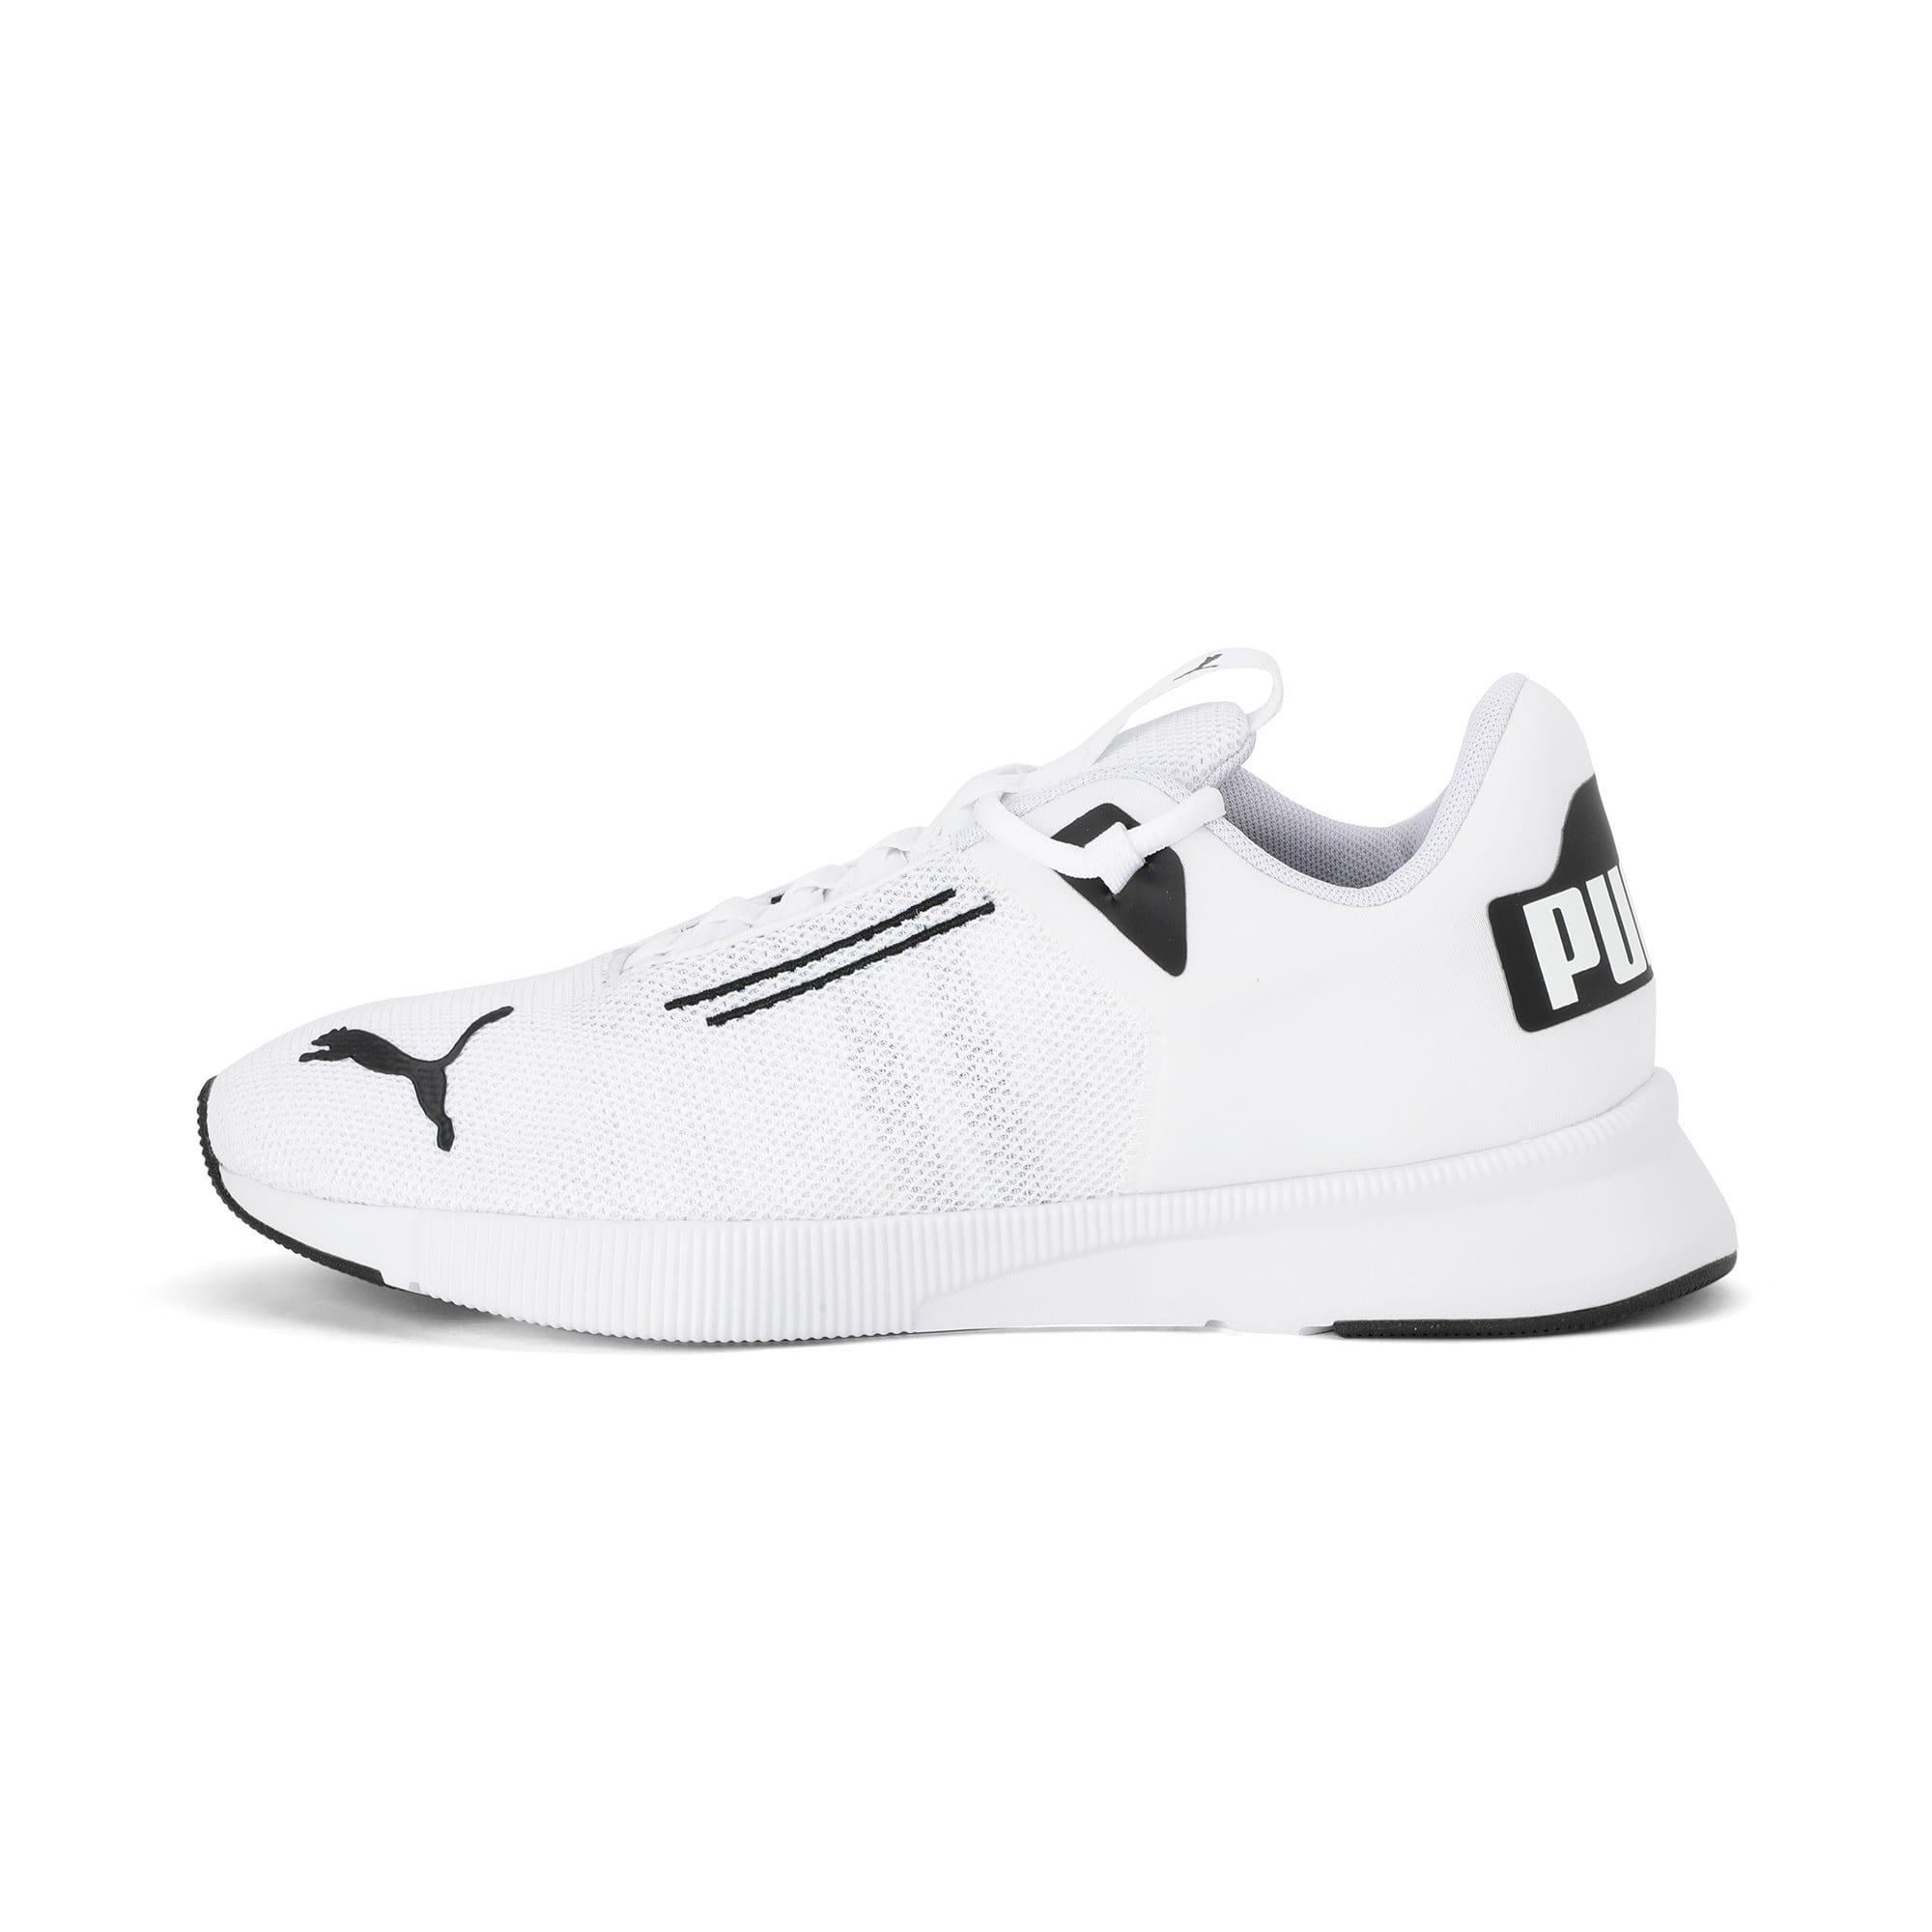 Thumbnail 1 of Flyer Modern Running Shoes, Puma White-Puma Black, medium-IND